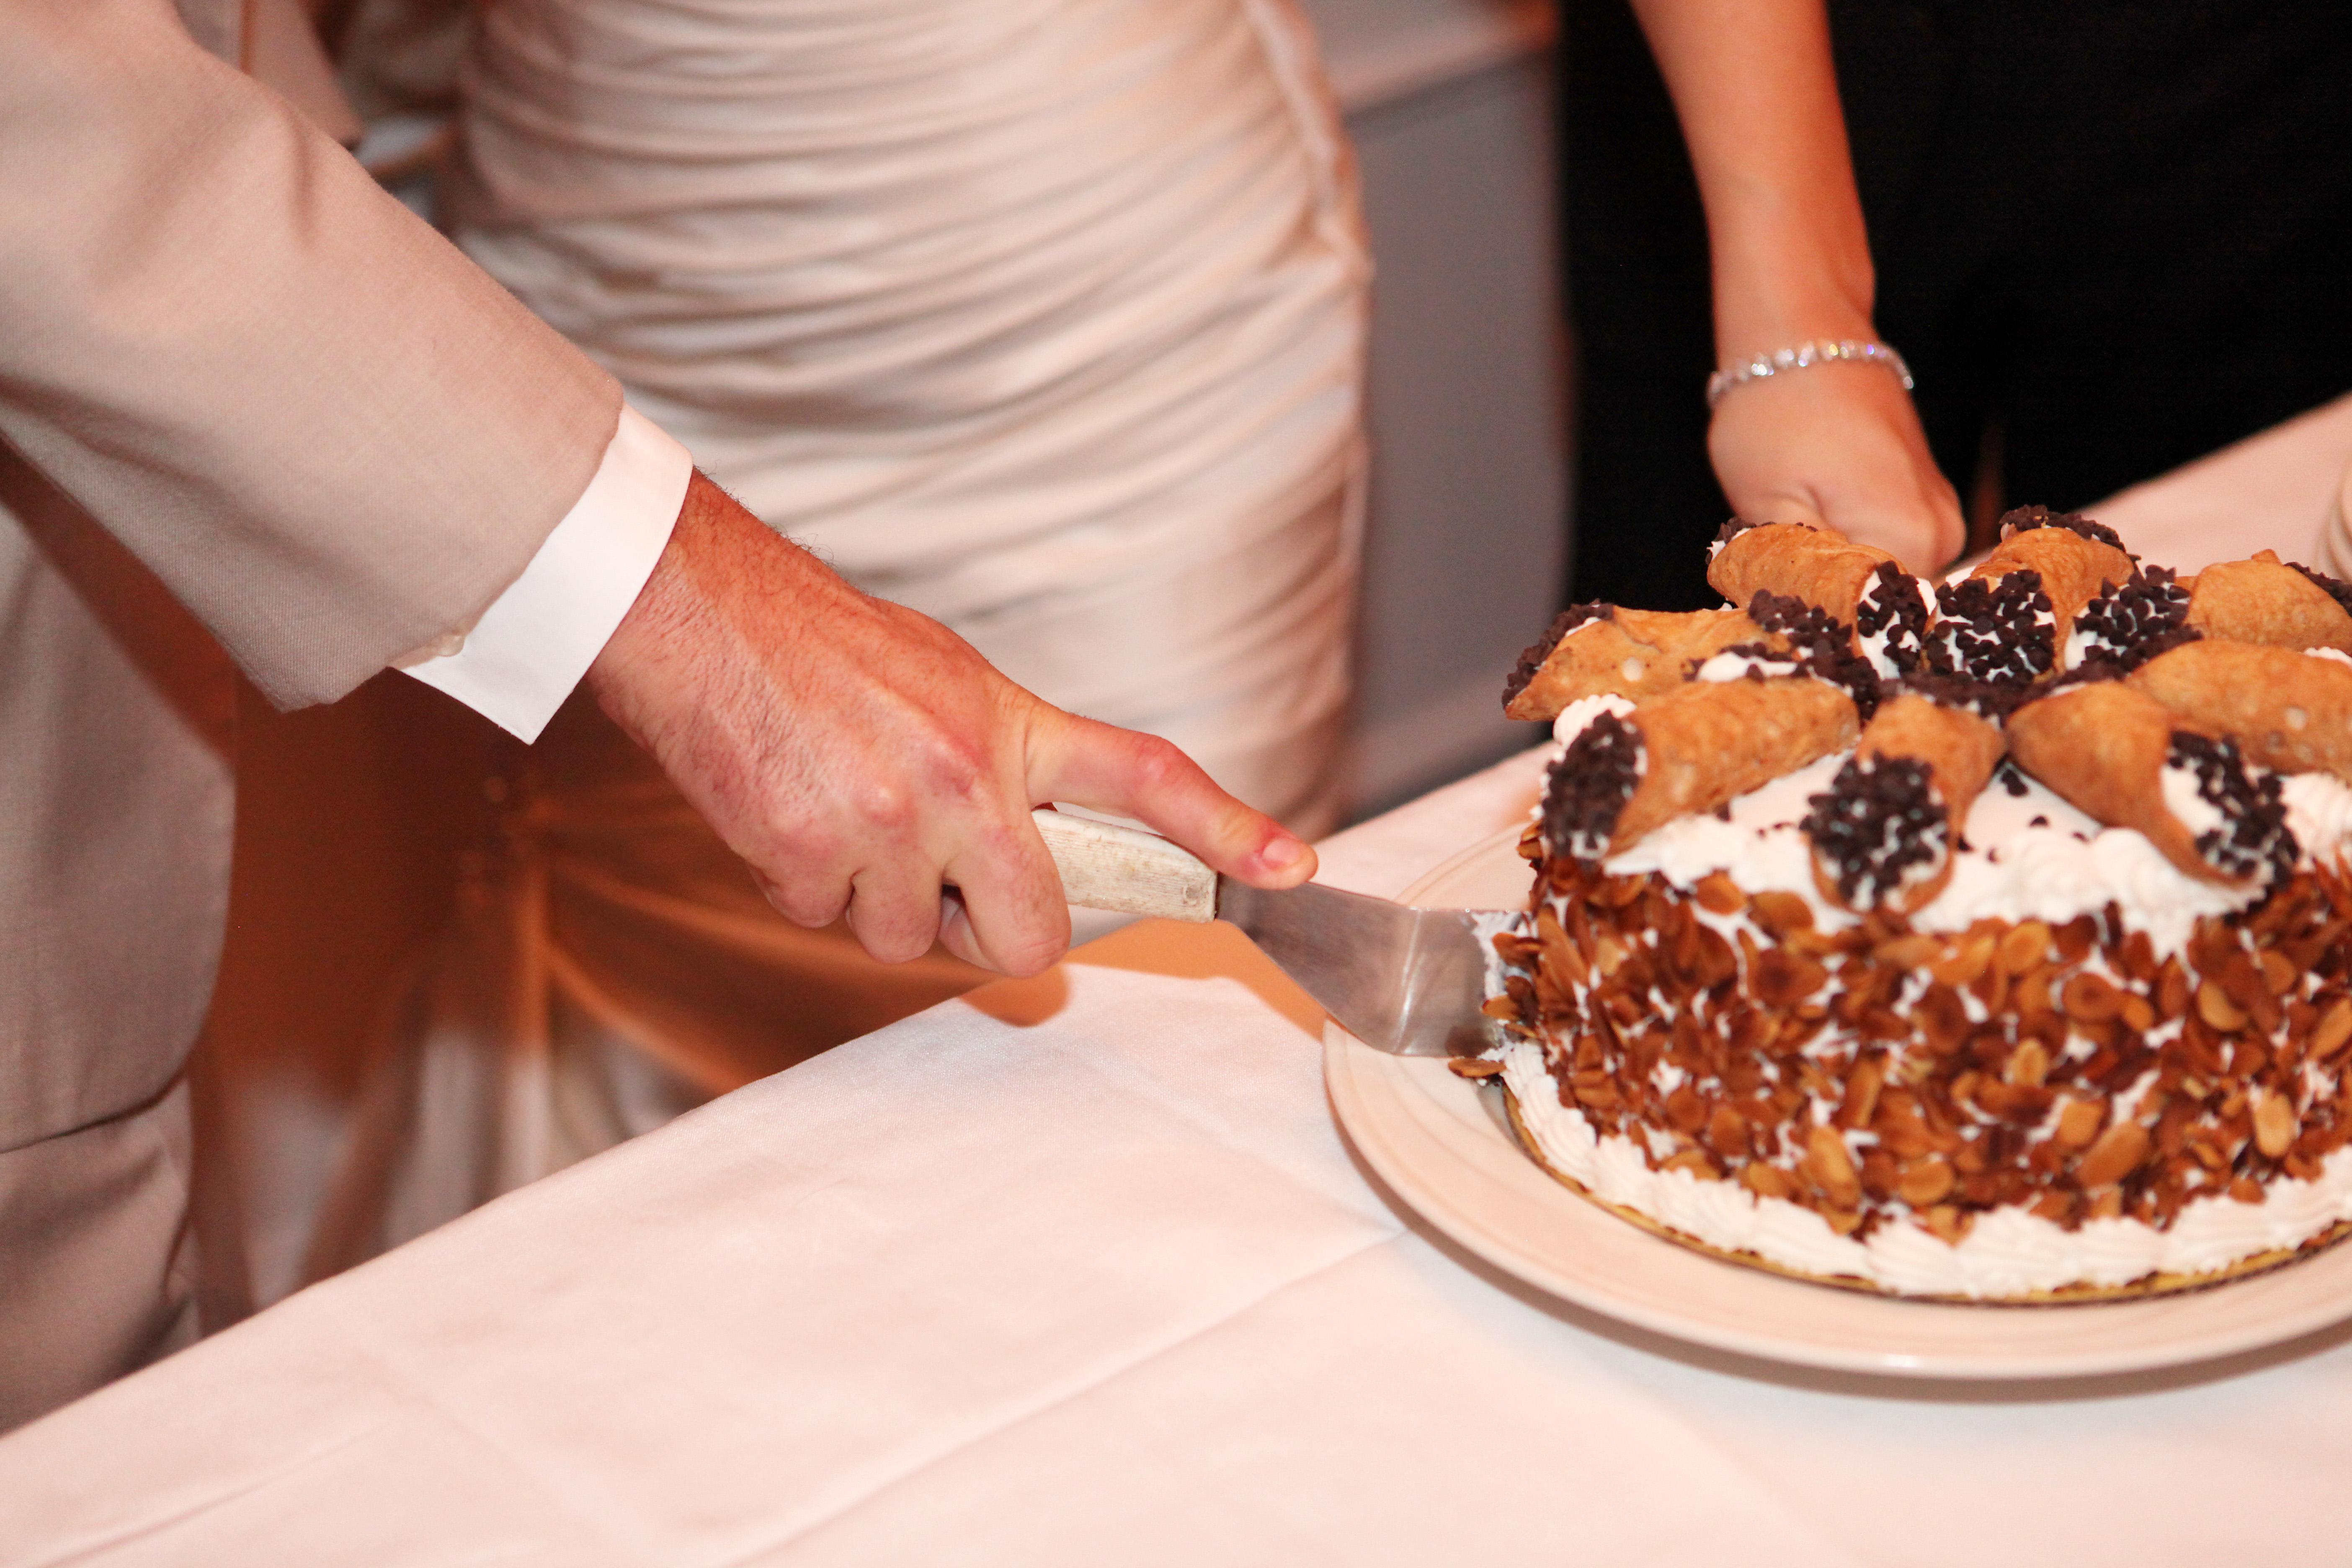 Cutting the Canolli Cake